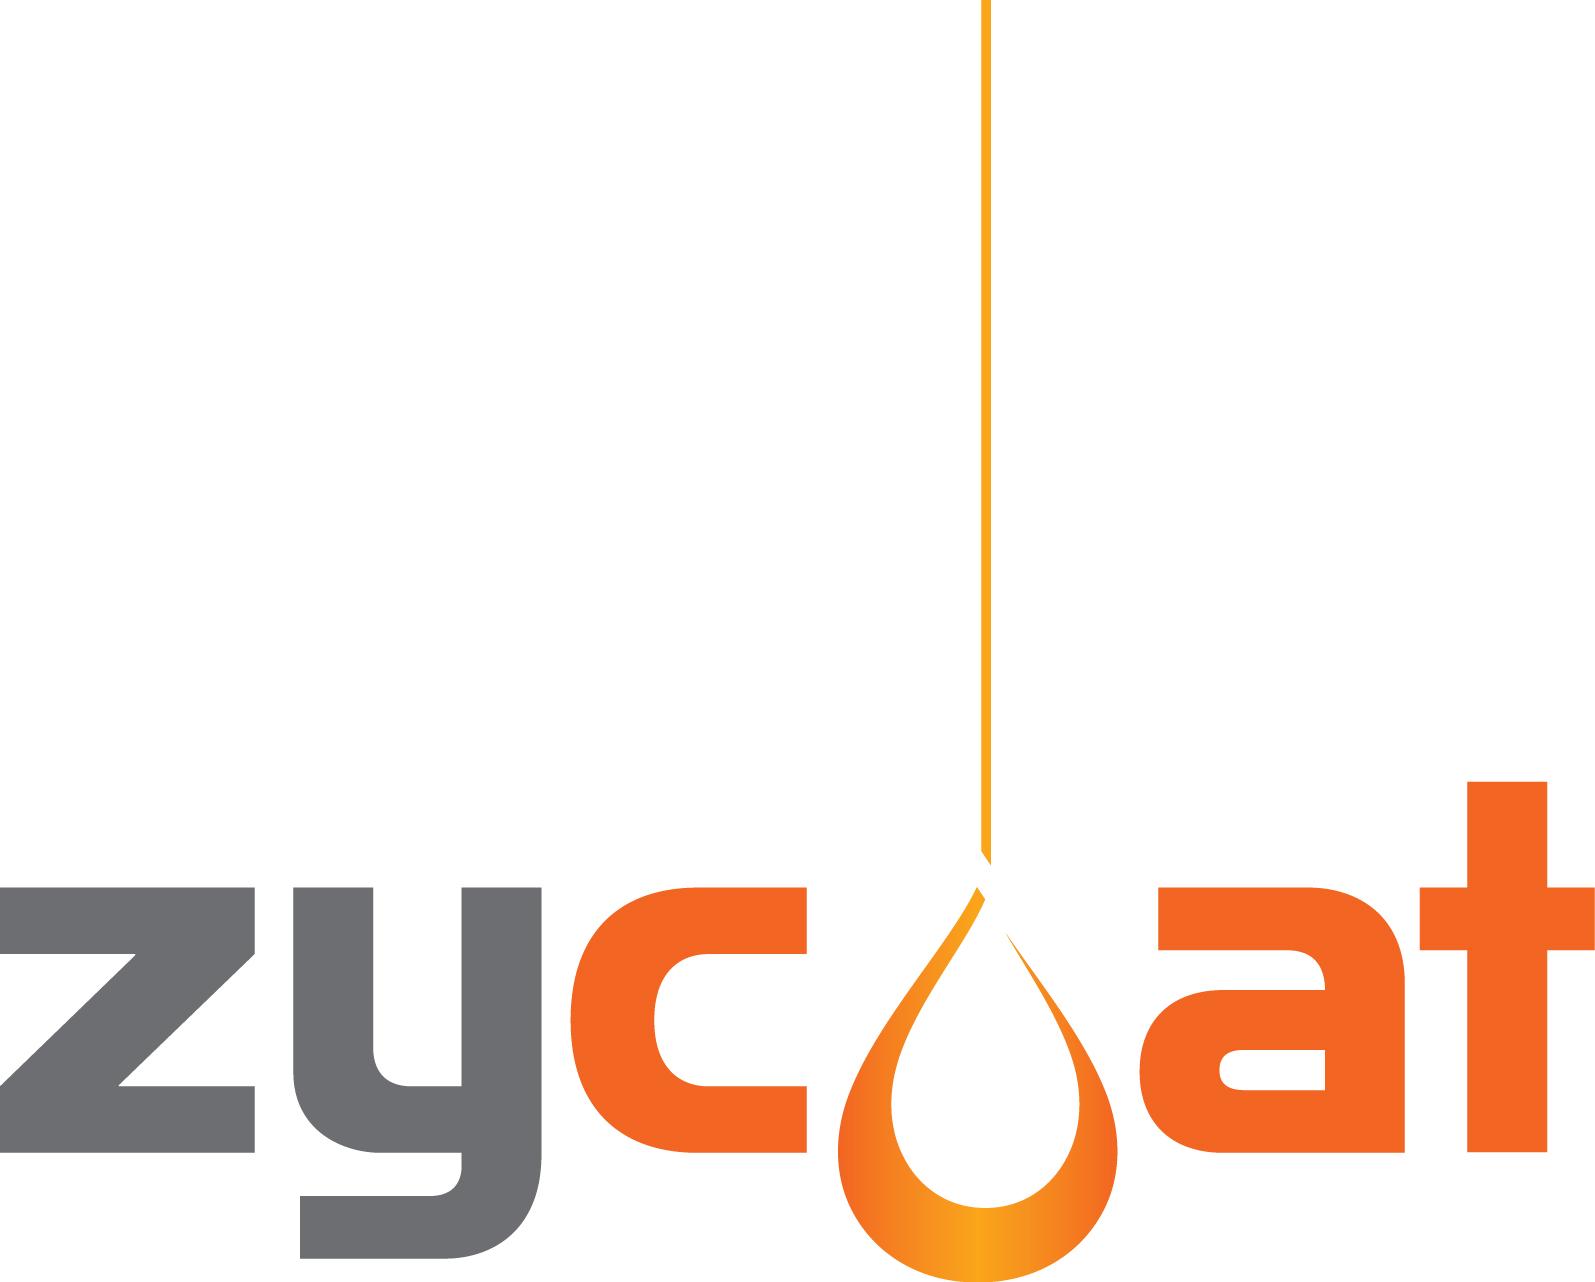 ZYCOAT, LLC